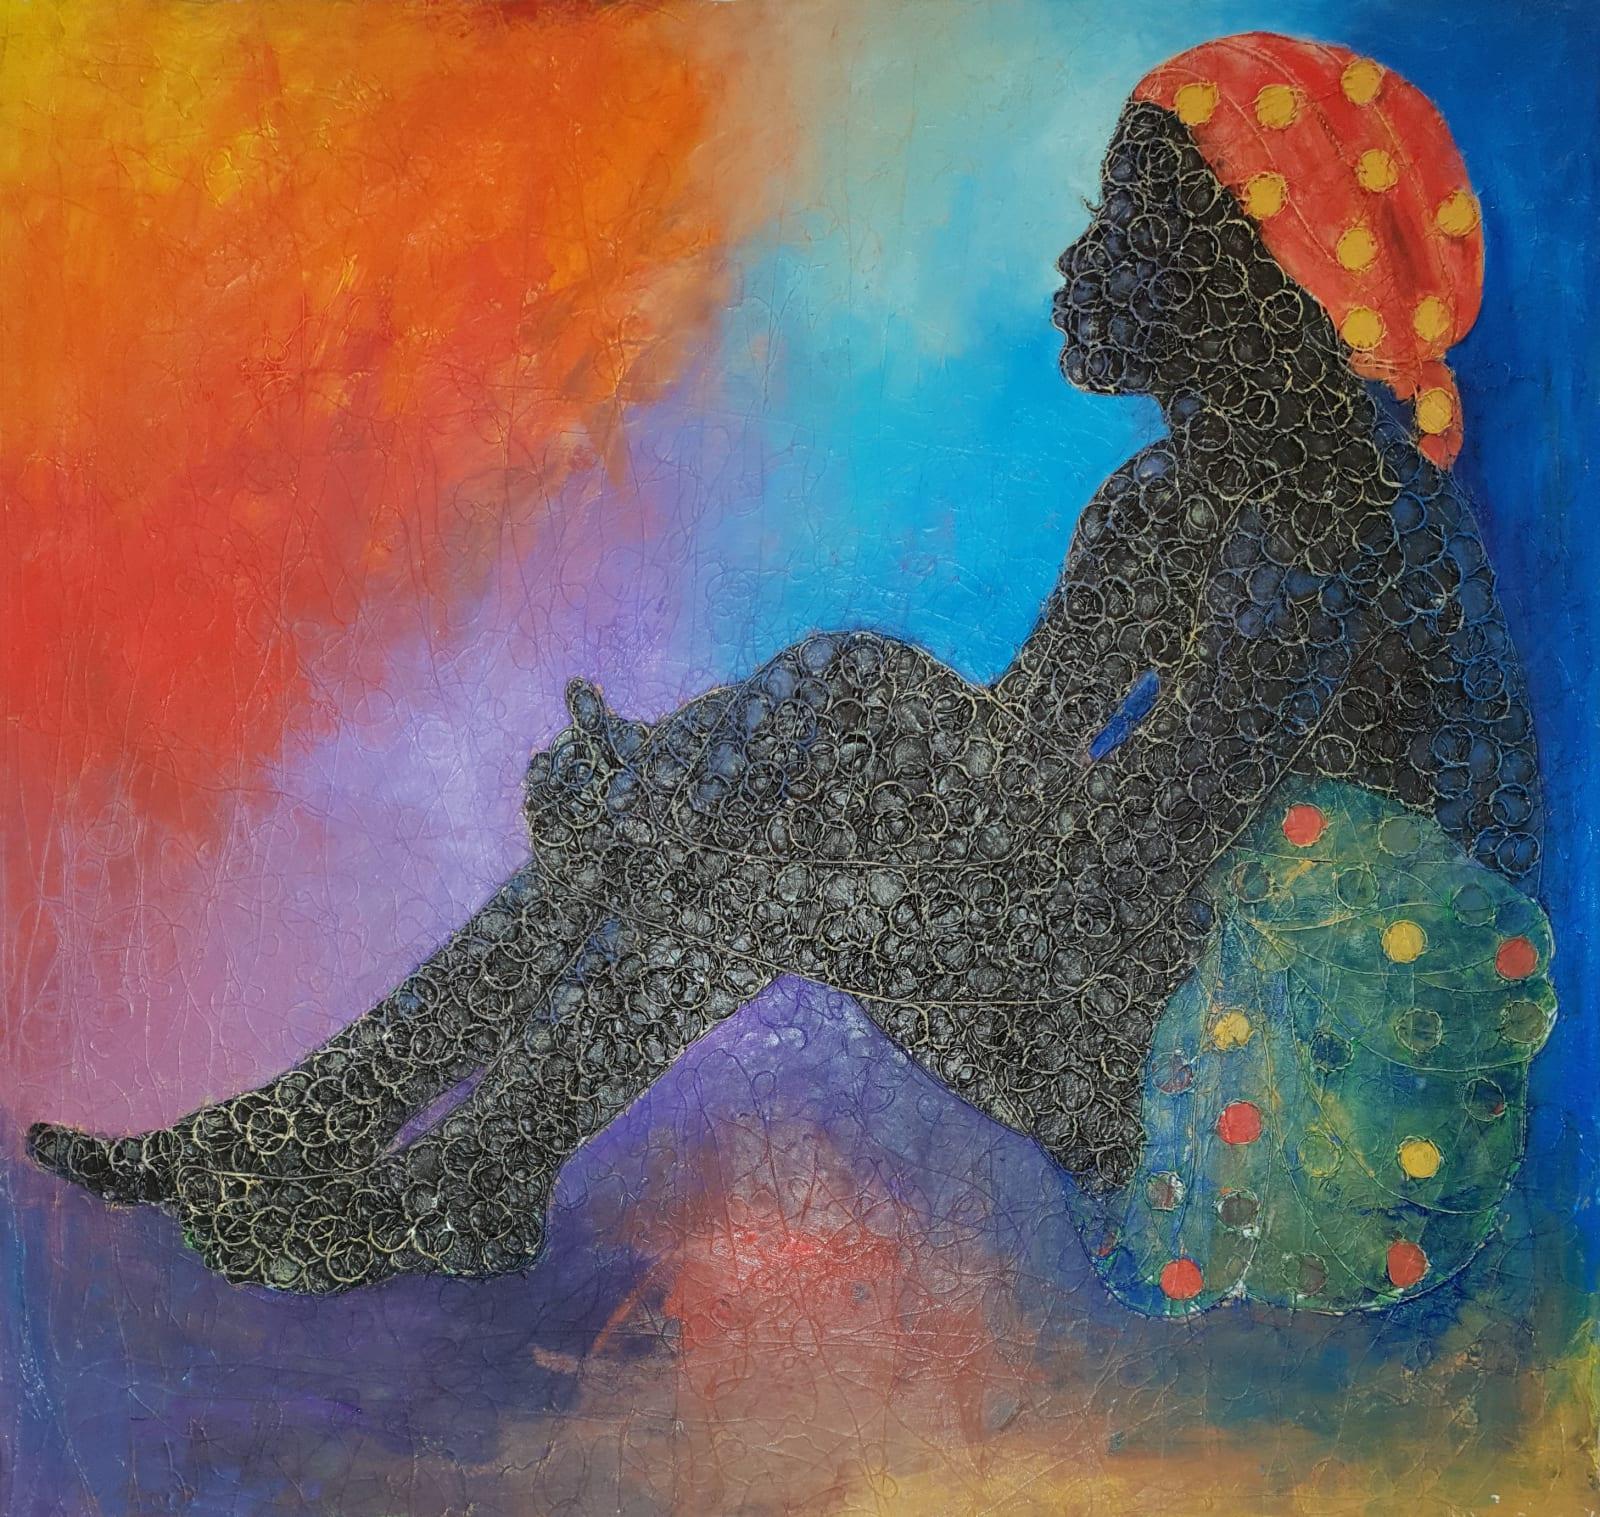 Uchay Chima, Damsel At Rest ii, 2018